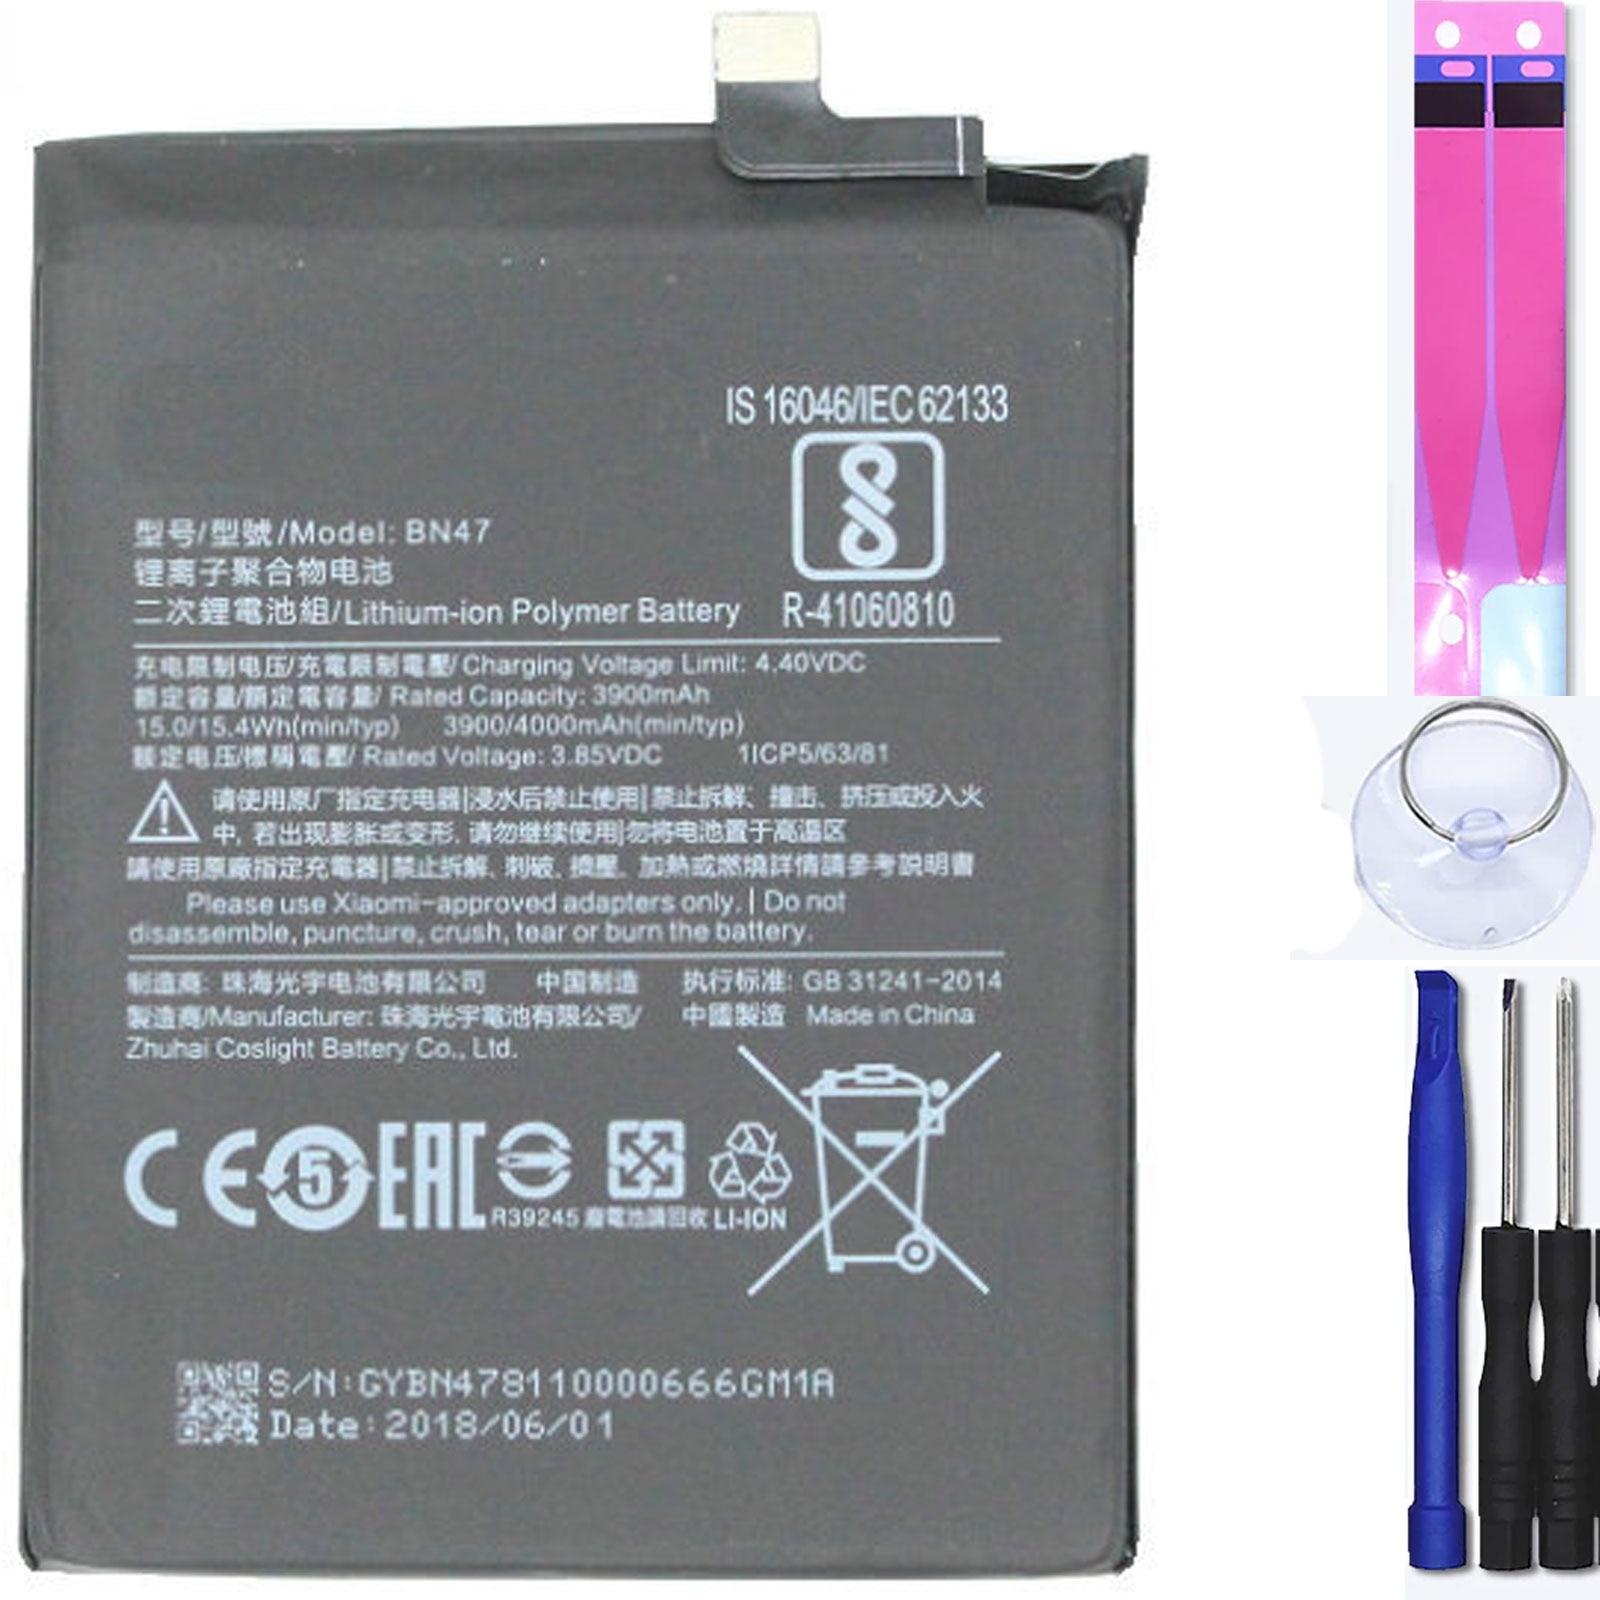 Аккумулятор для Xiaomi A2 Lite, Redmi 6 Pro, Redmi 6X, 6, Mpn Оригинал: Bn47